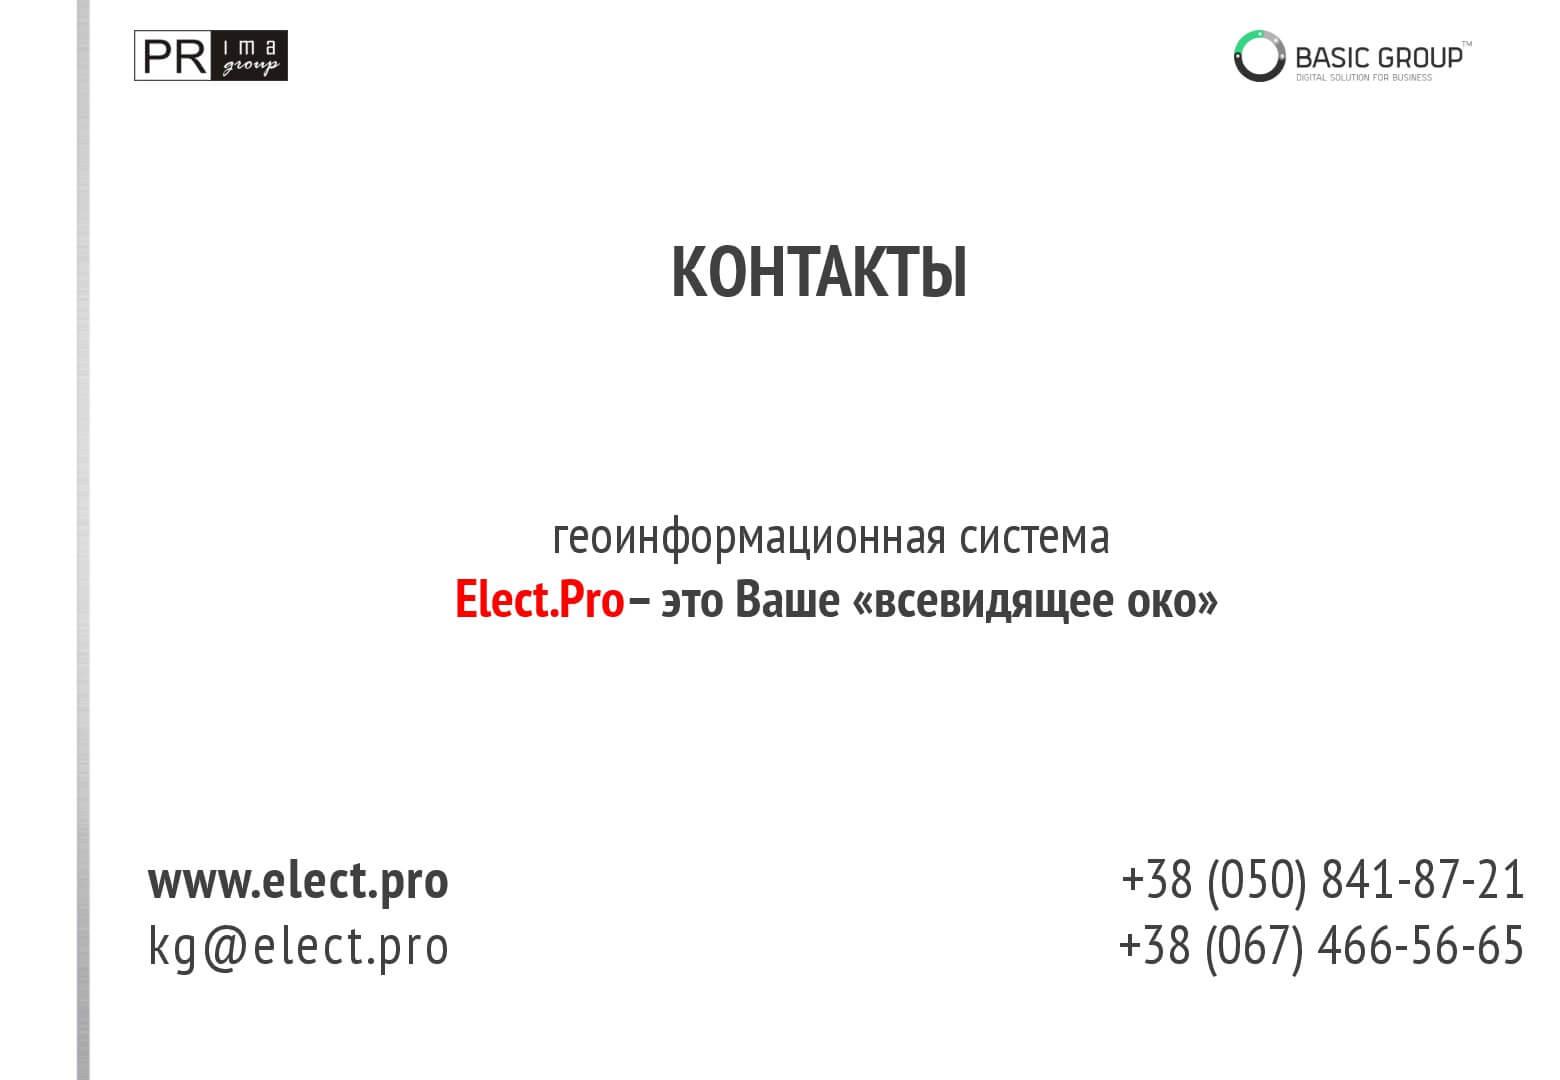 Elect.pro-BG-UA-035